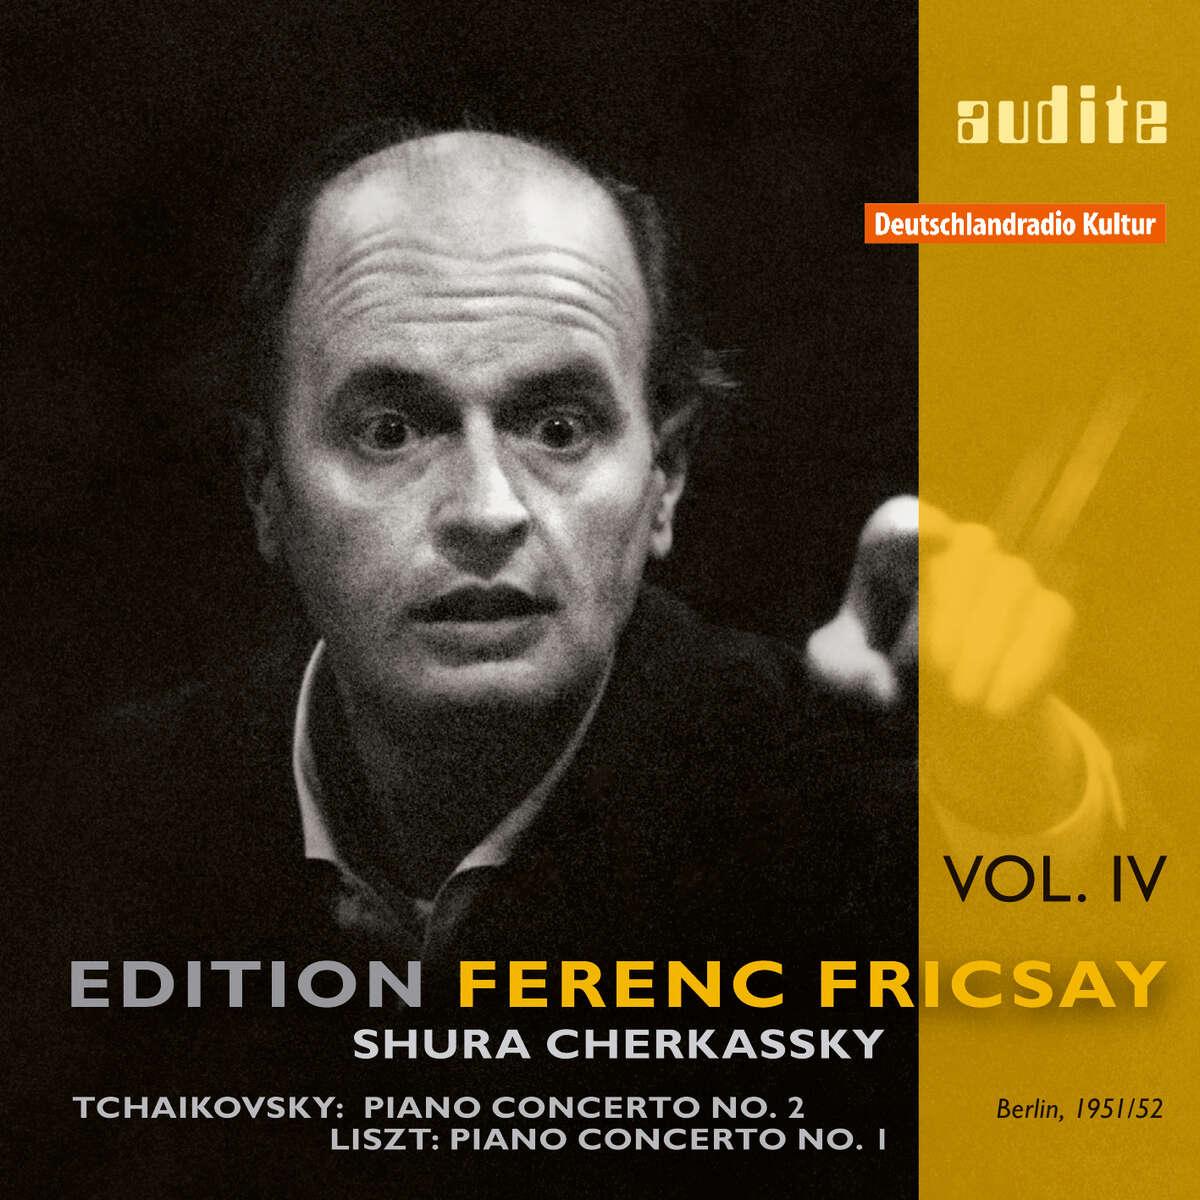 Edition Ferenc Fricsay (IV) – P. I. Tchaikovsky: Piano Concerto No. 2 & F. Liszt: Piano Concerto No. 1